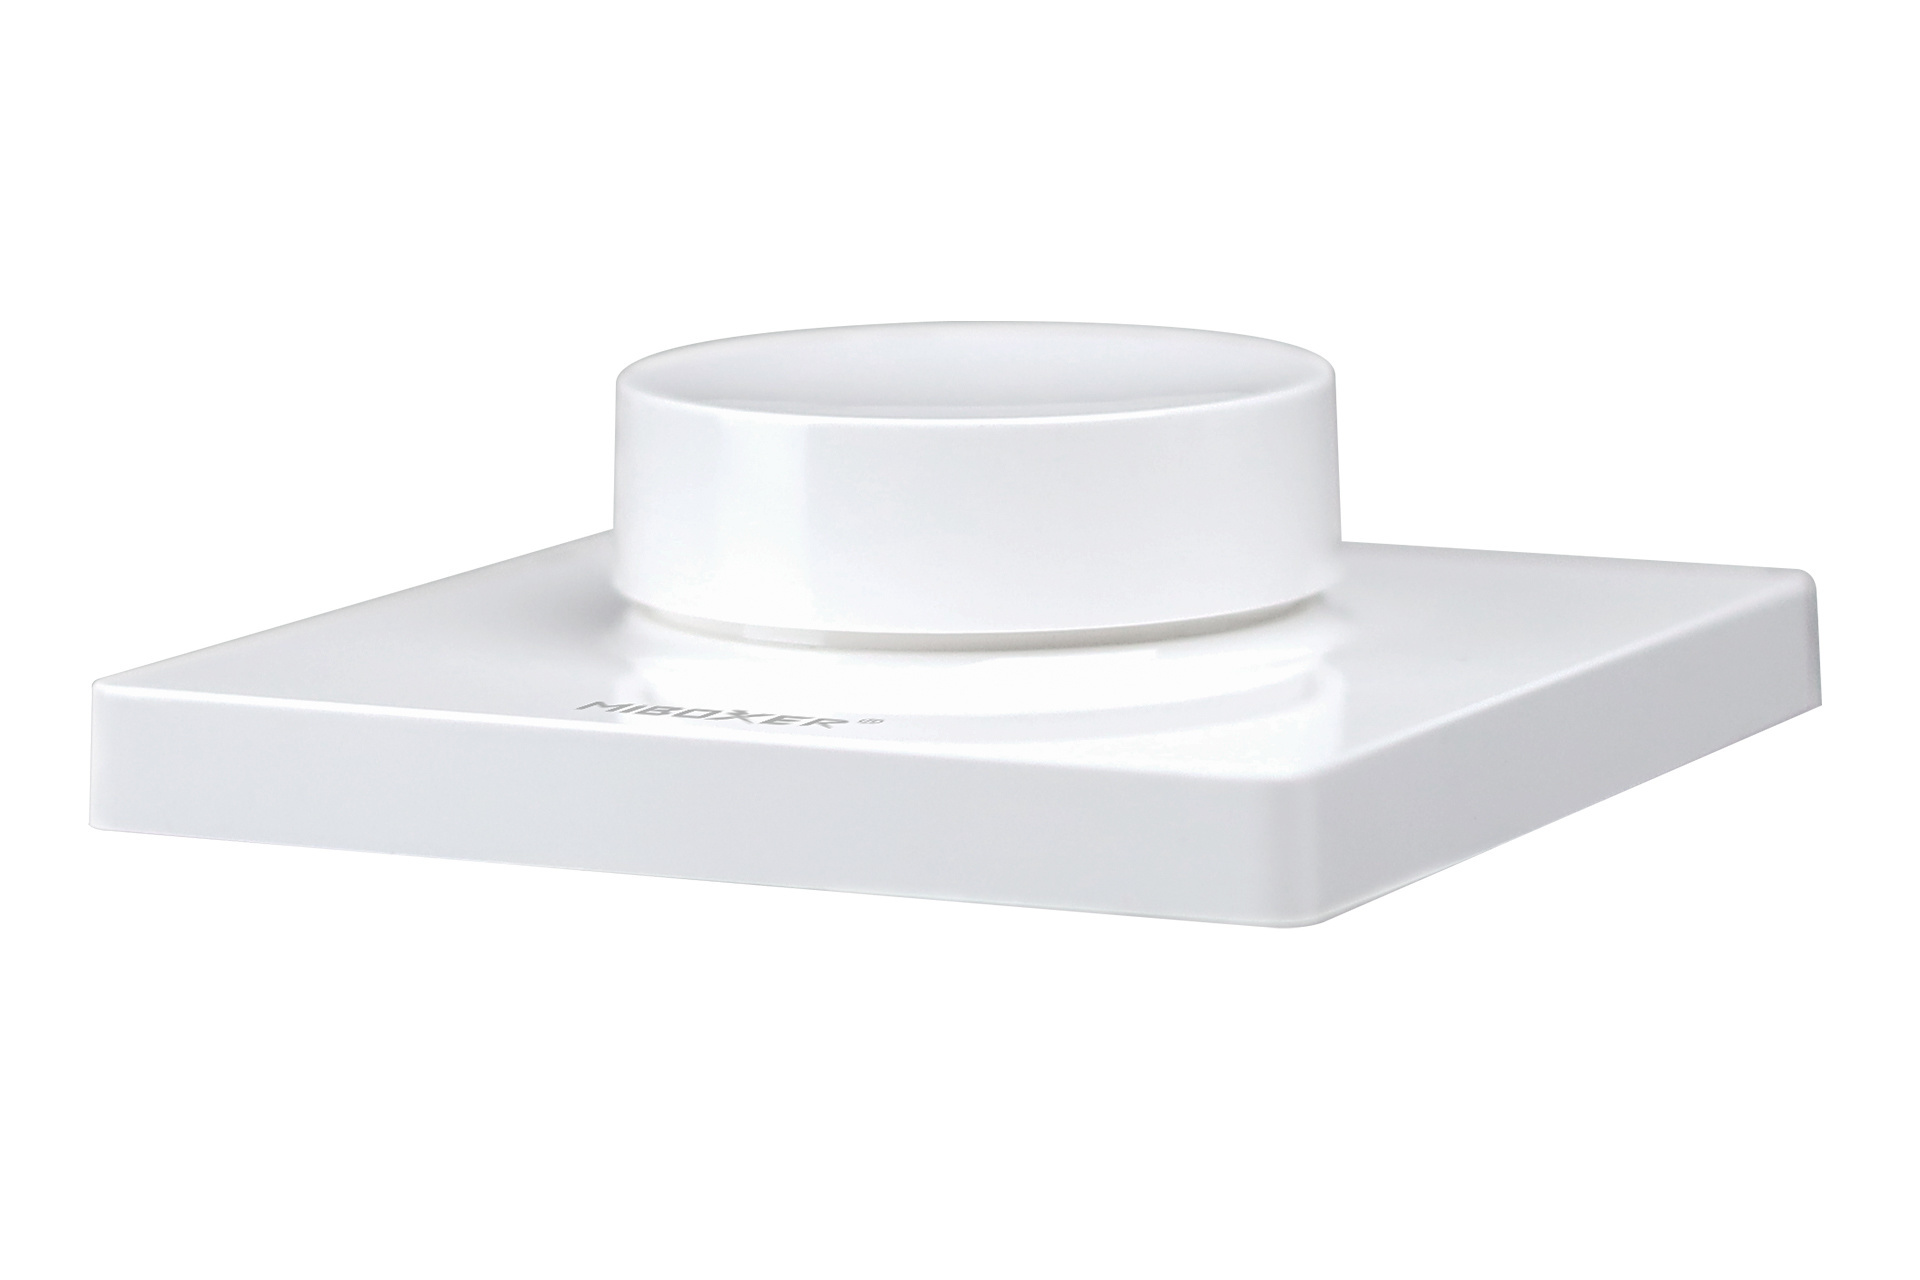 MiLight Draadloze LED draaiknop muurdimmer voor Miboxe Triac dimmer module